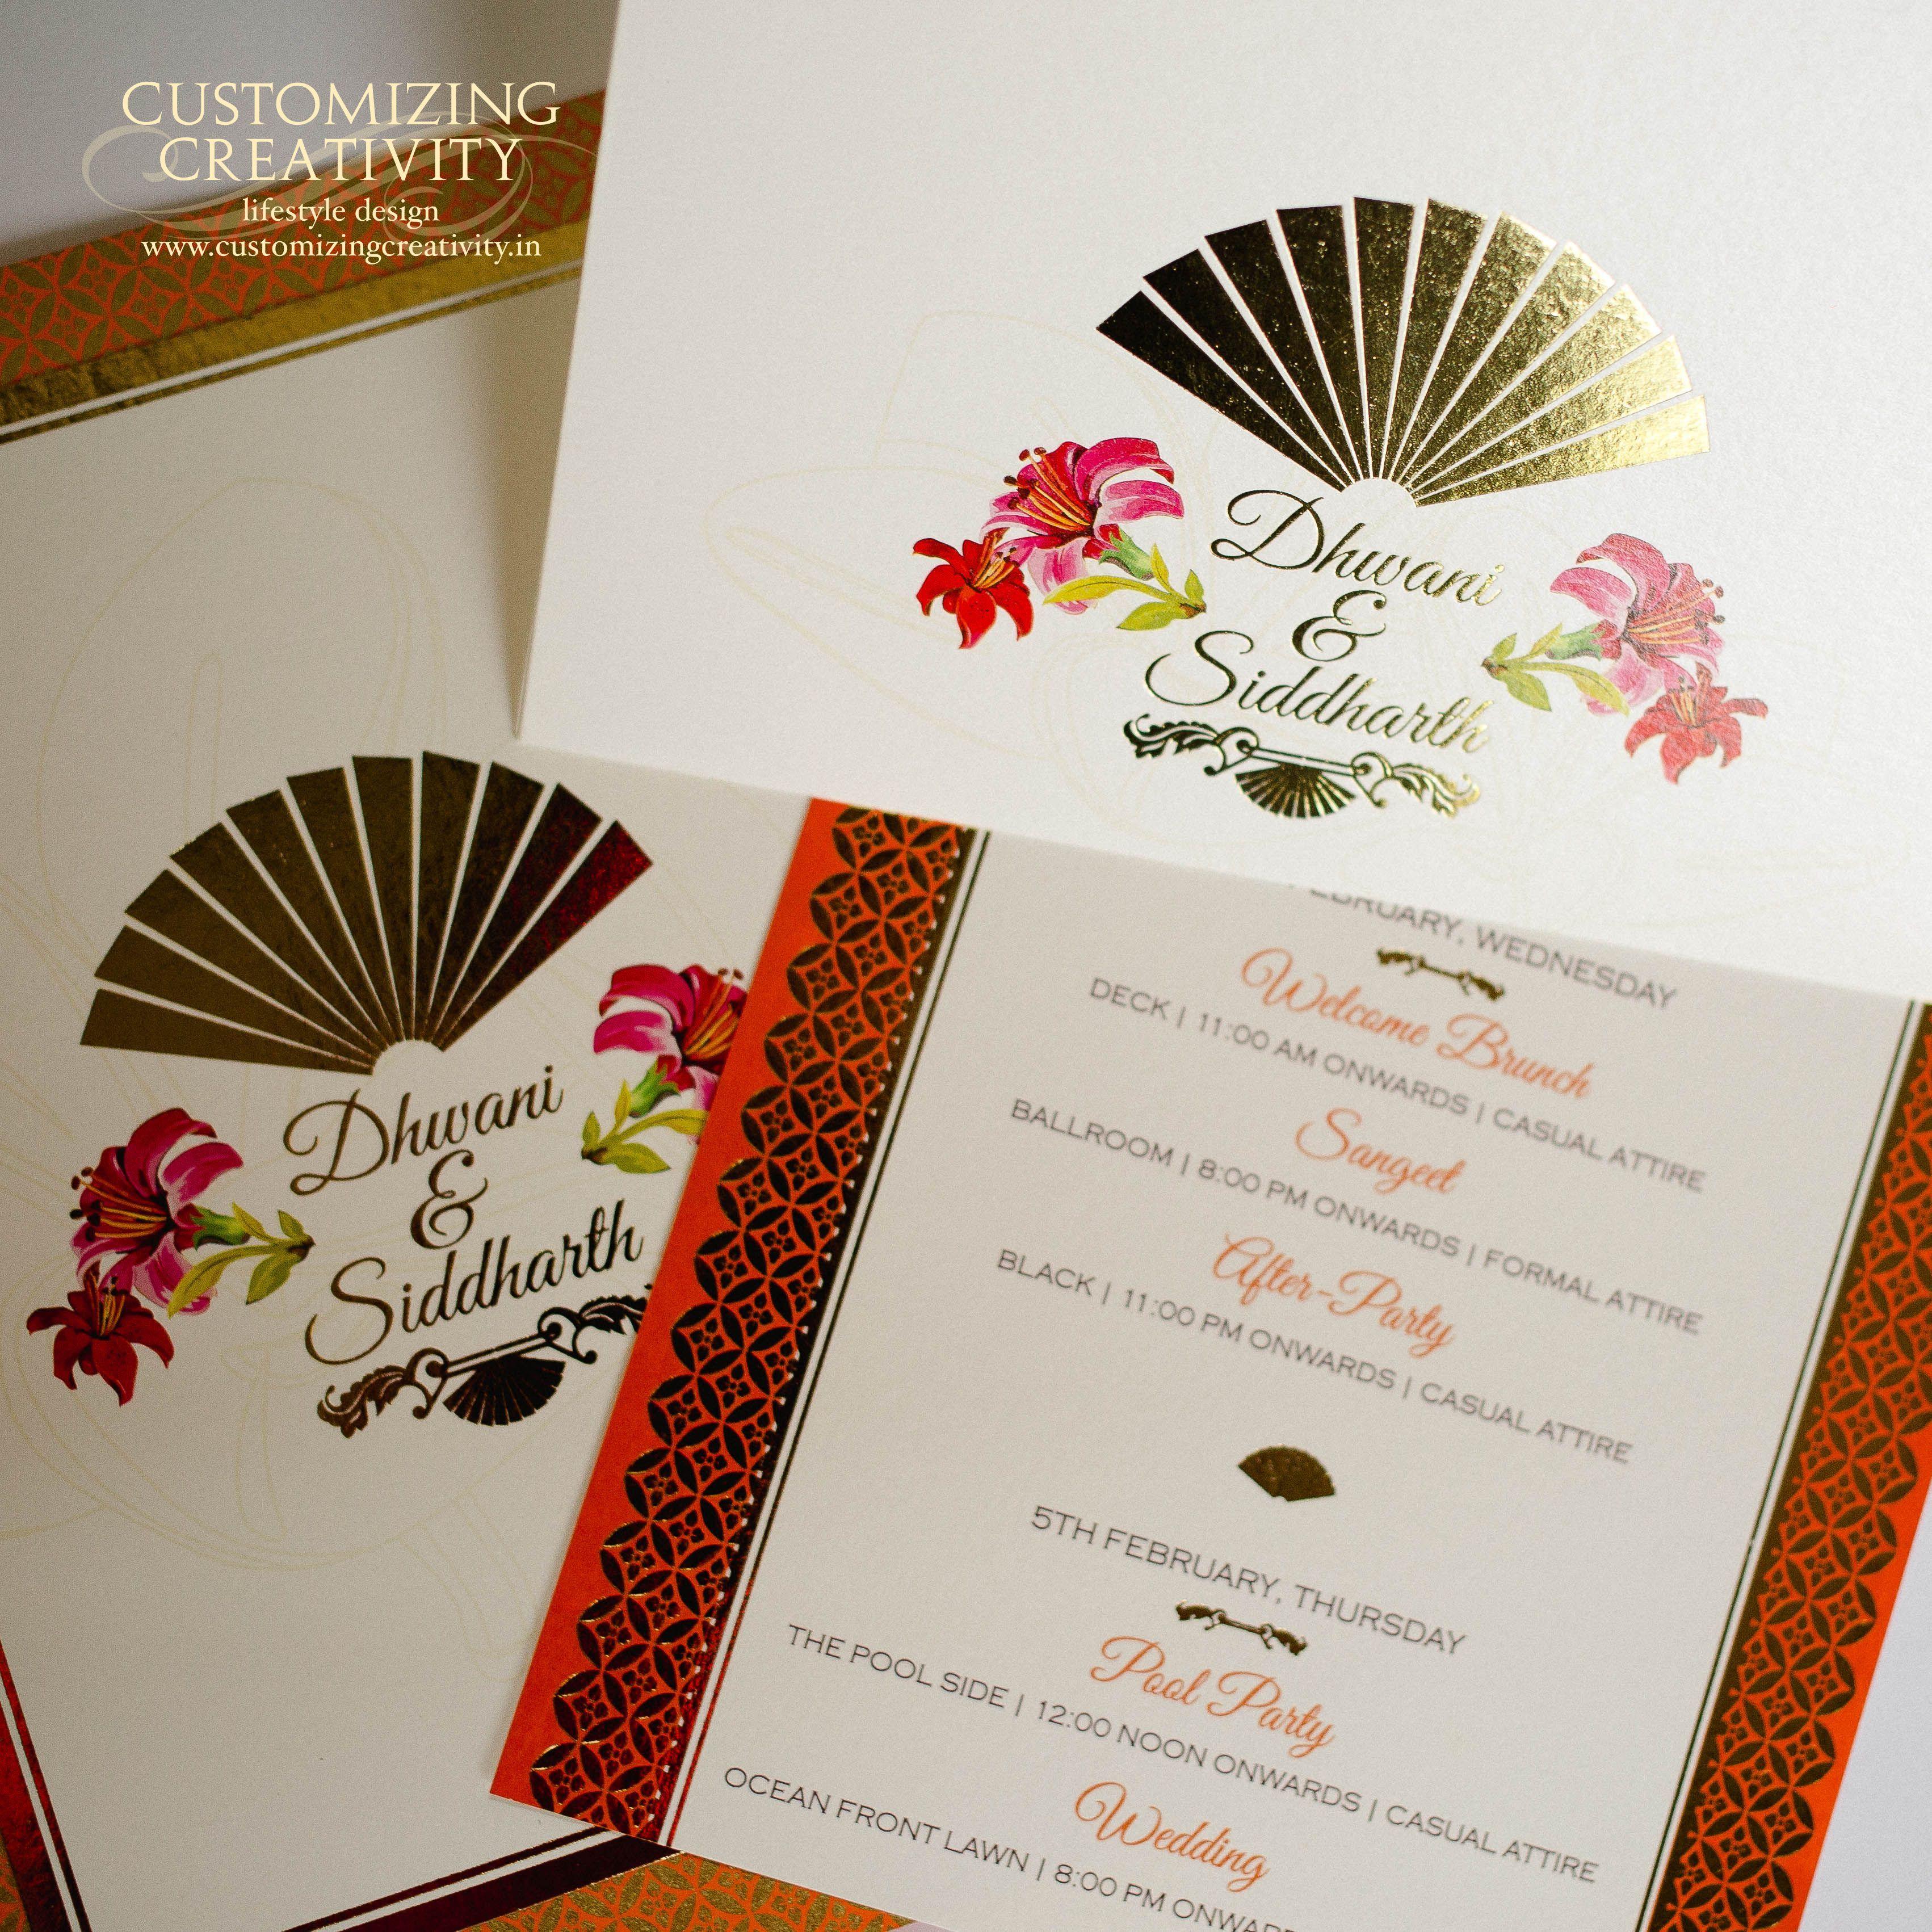 wedding invitation cards mumbai india%0A Wedding Invitations  Cards  Invitations  Invites  Wedding Stationery   Customized invitations  Custom made Cards  Custom Invites  Stationery   Designer cards